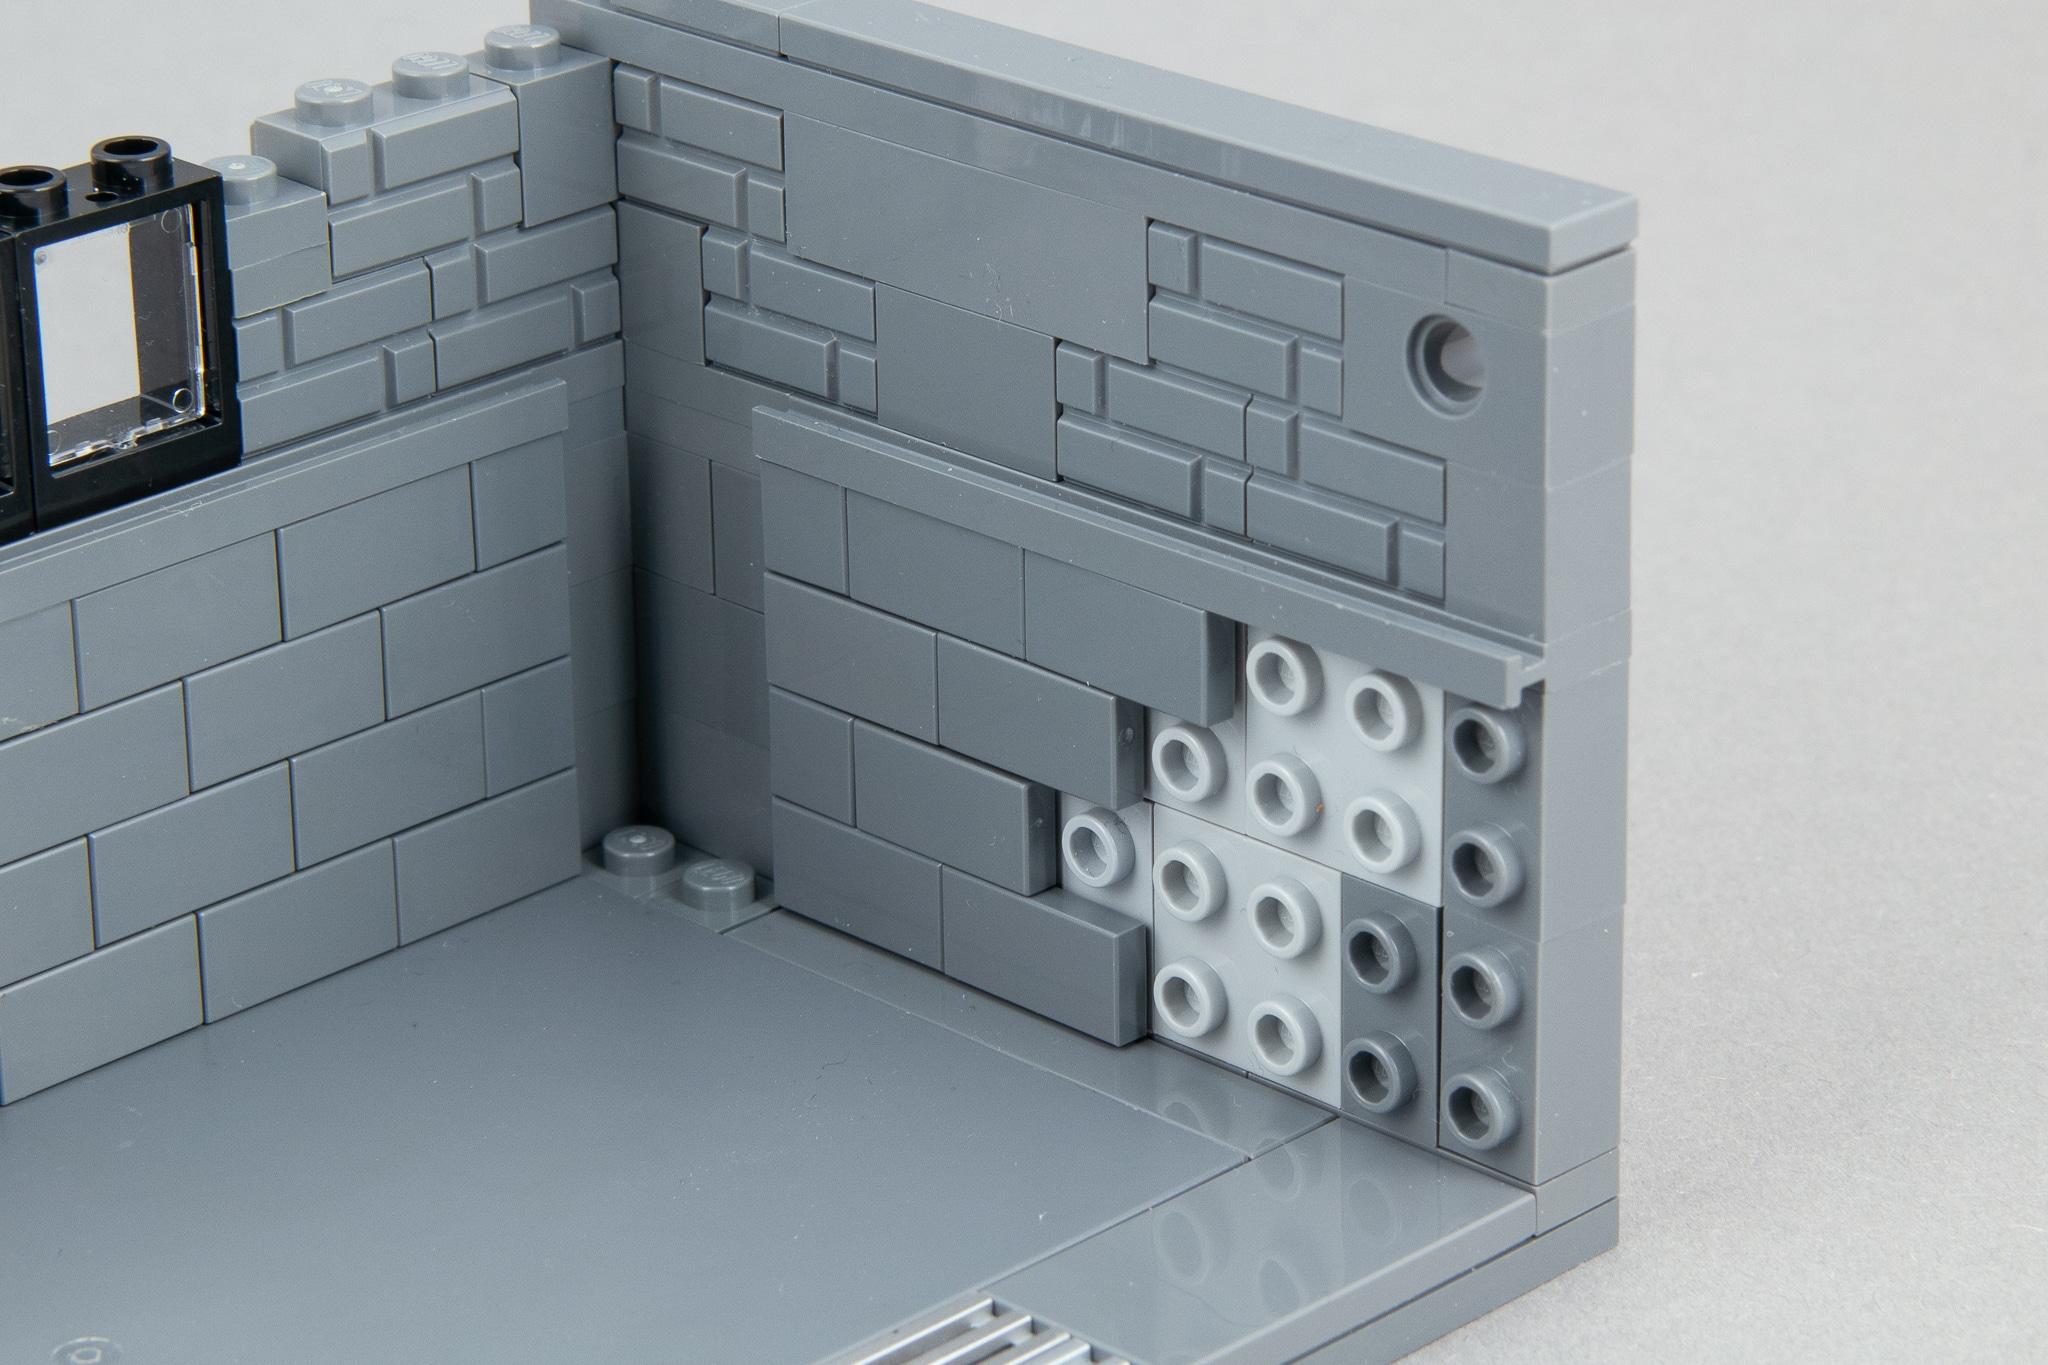 LEGO Moc Waschkeller (14)